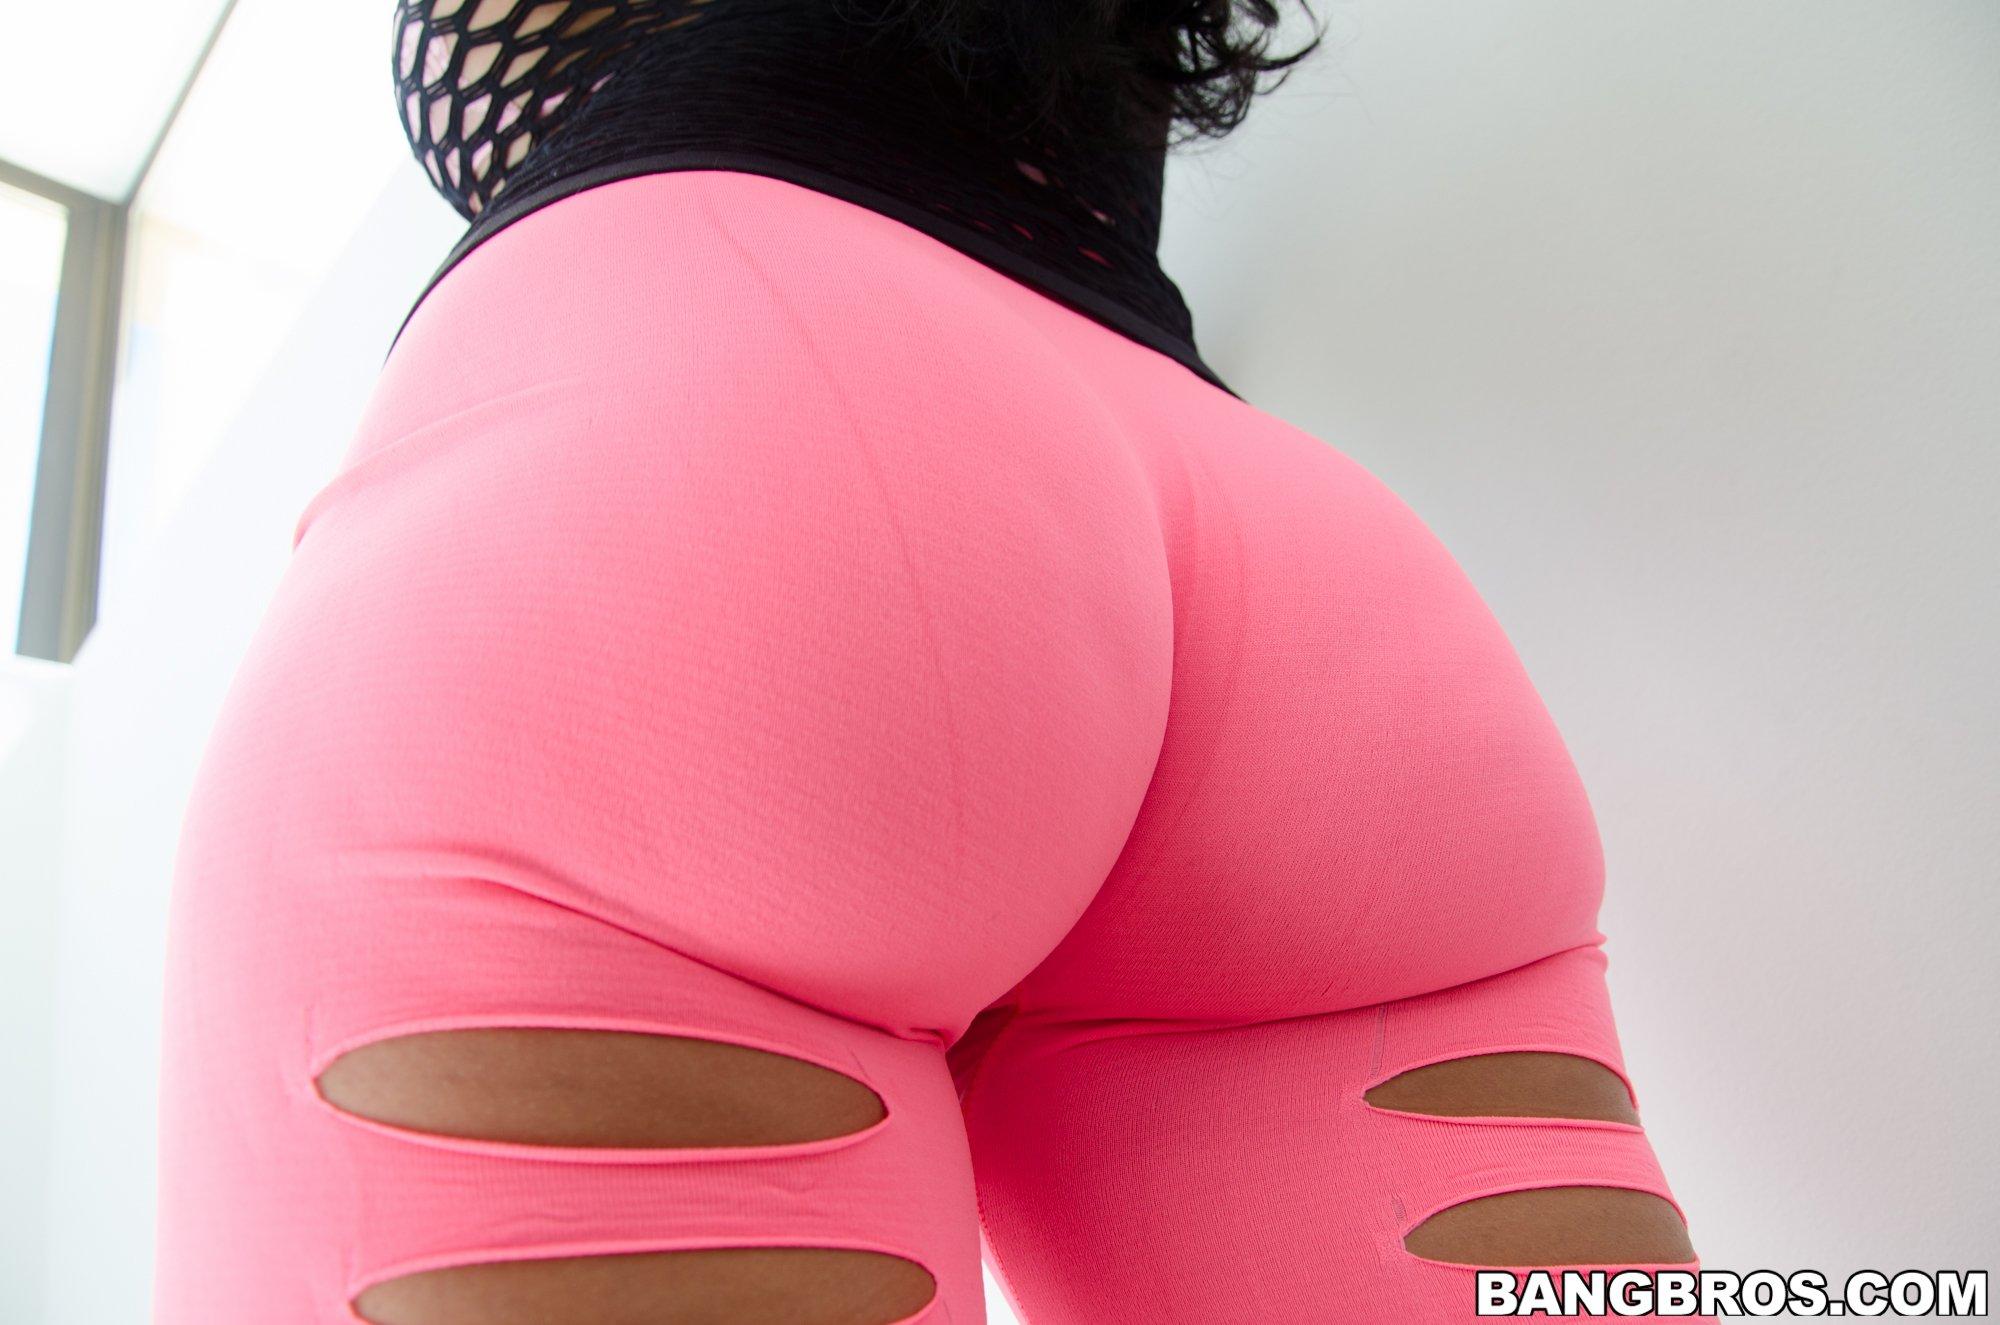 Marta la croft in pink spandex Marta La Croft Big Ass Slut In Spandex Asses Photo